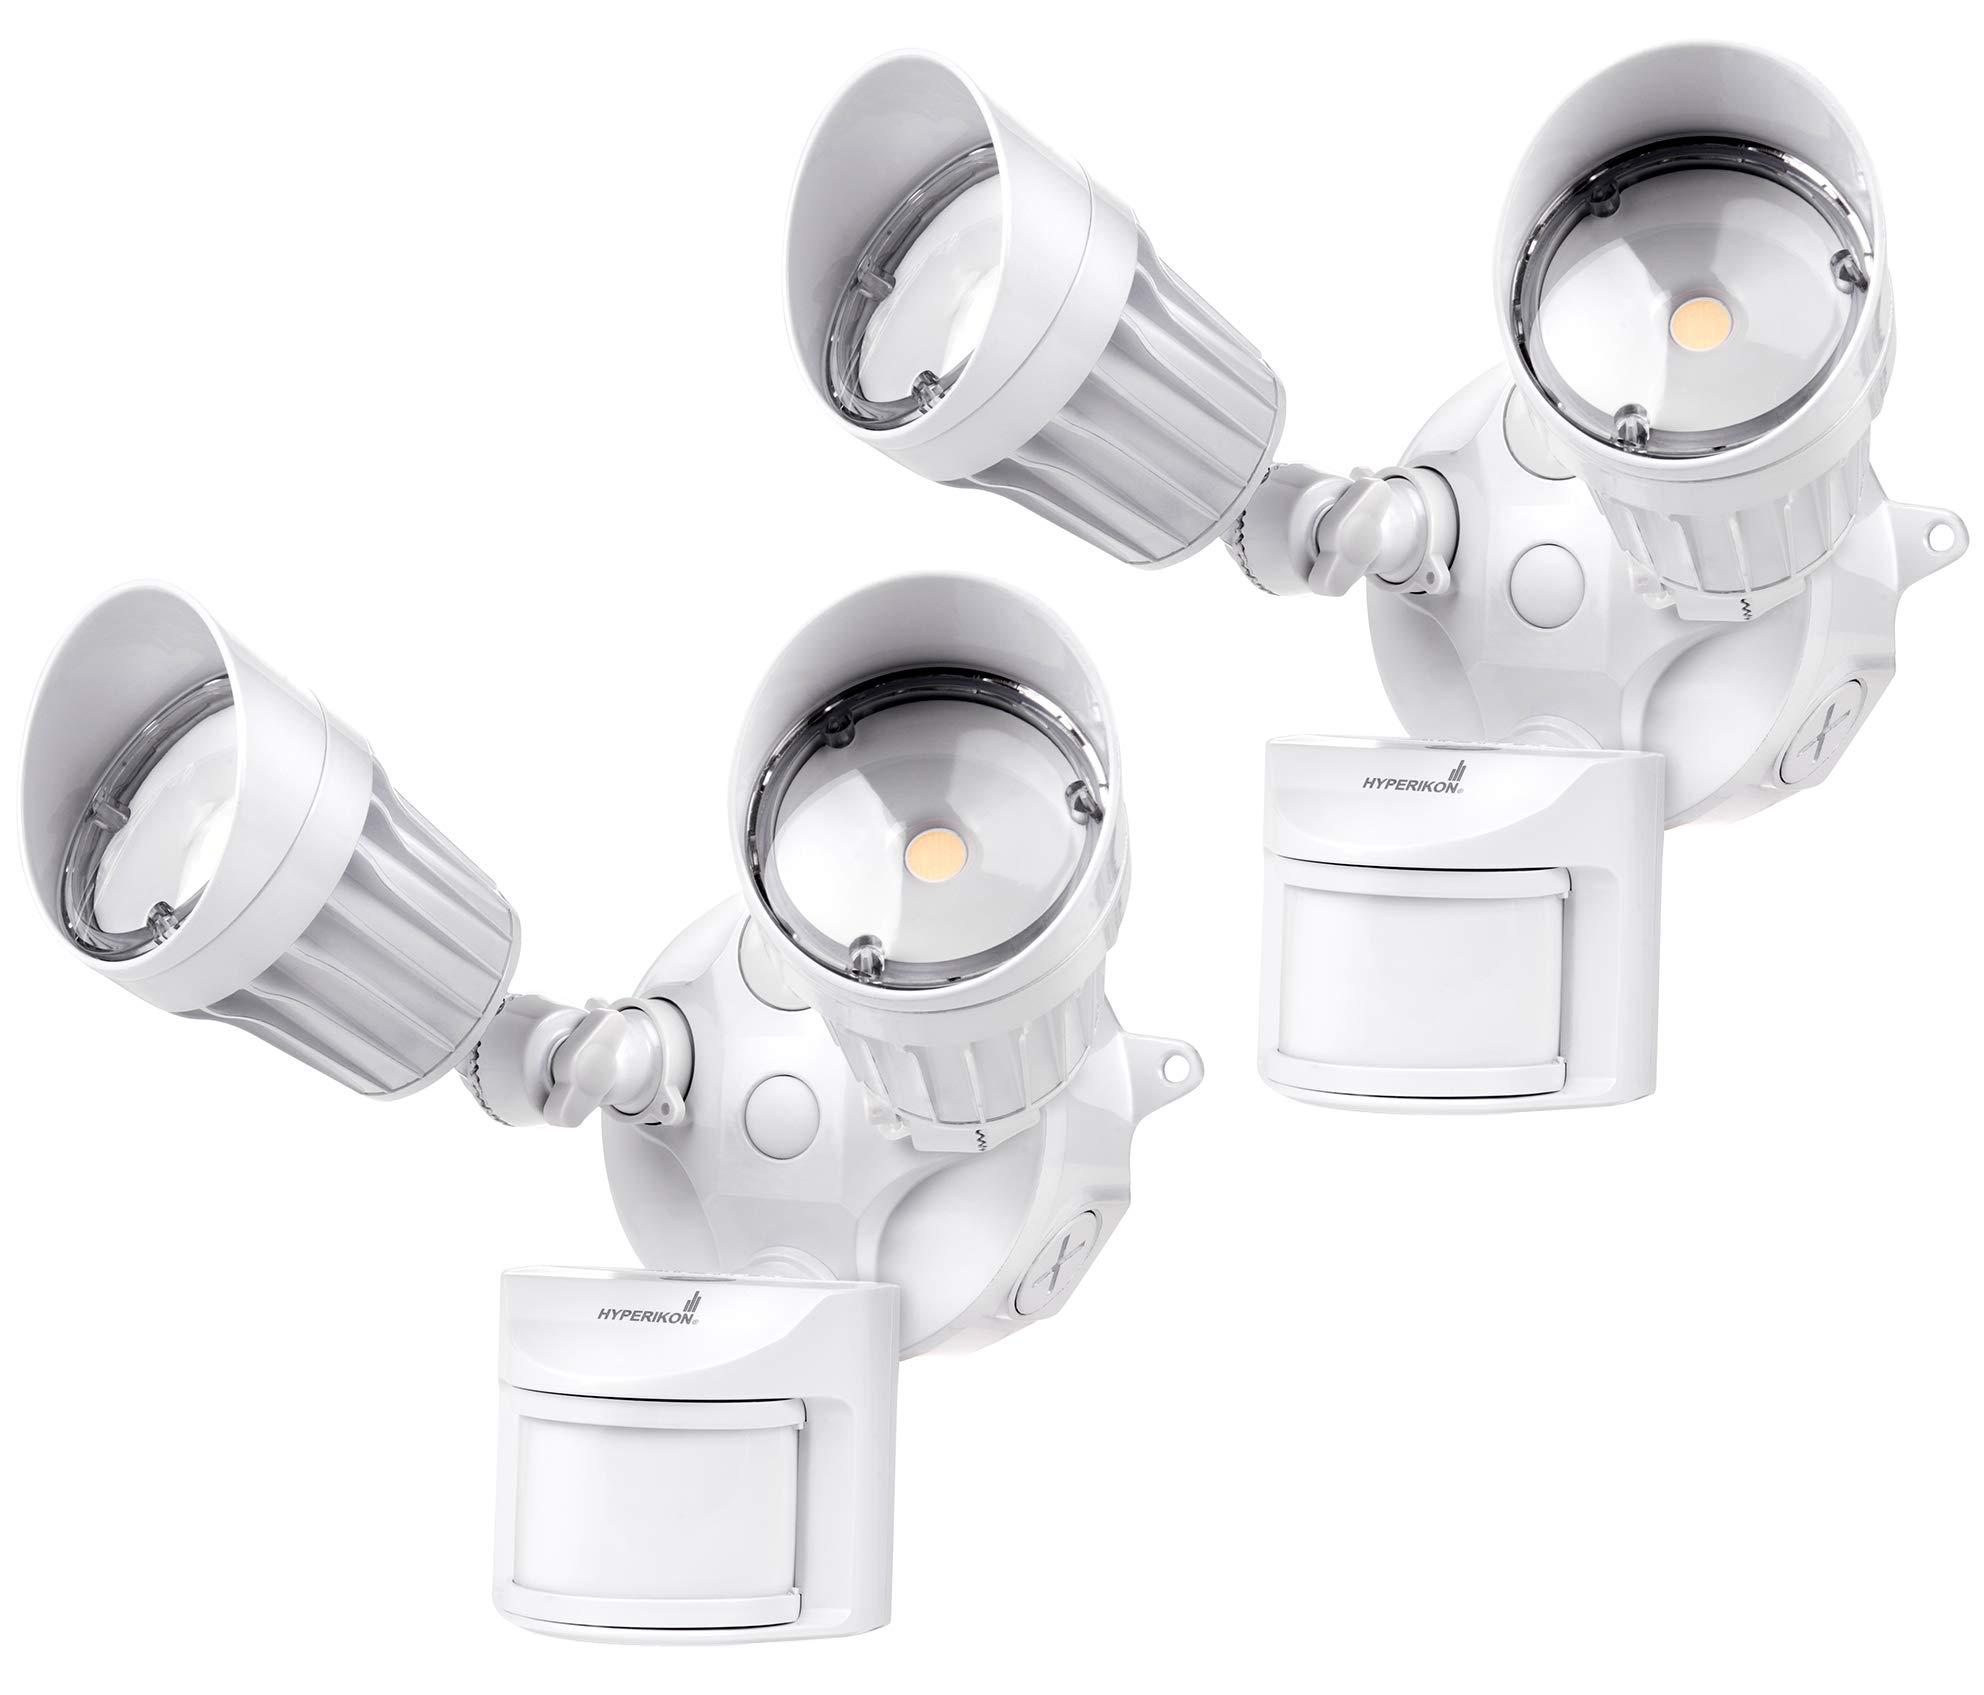 Hyperikon LED White Security Light with Motion Sensor, 20W (100 Watt), Outdoor Flood Light Dusk to Dawn, 5000K, 2 Head IP65, 2 Pack by Hyperikon